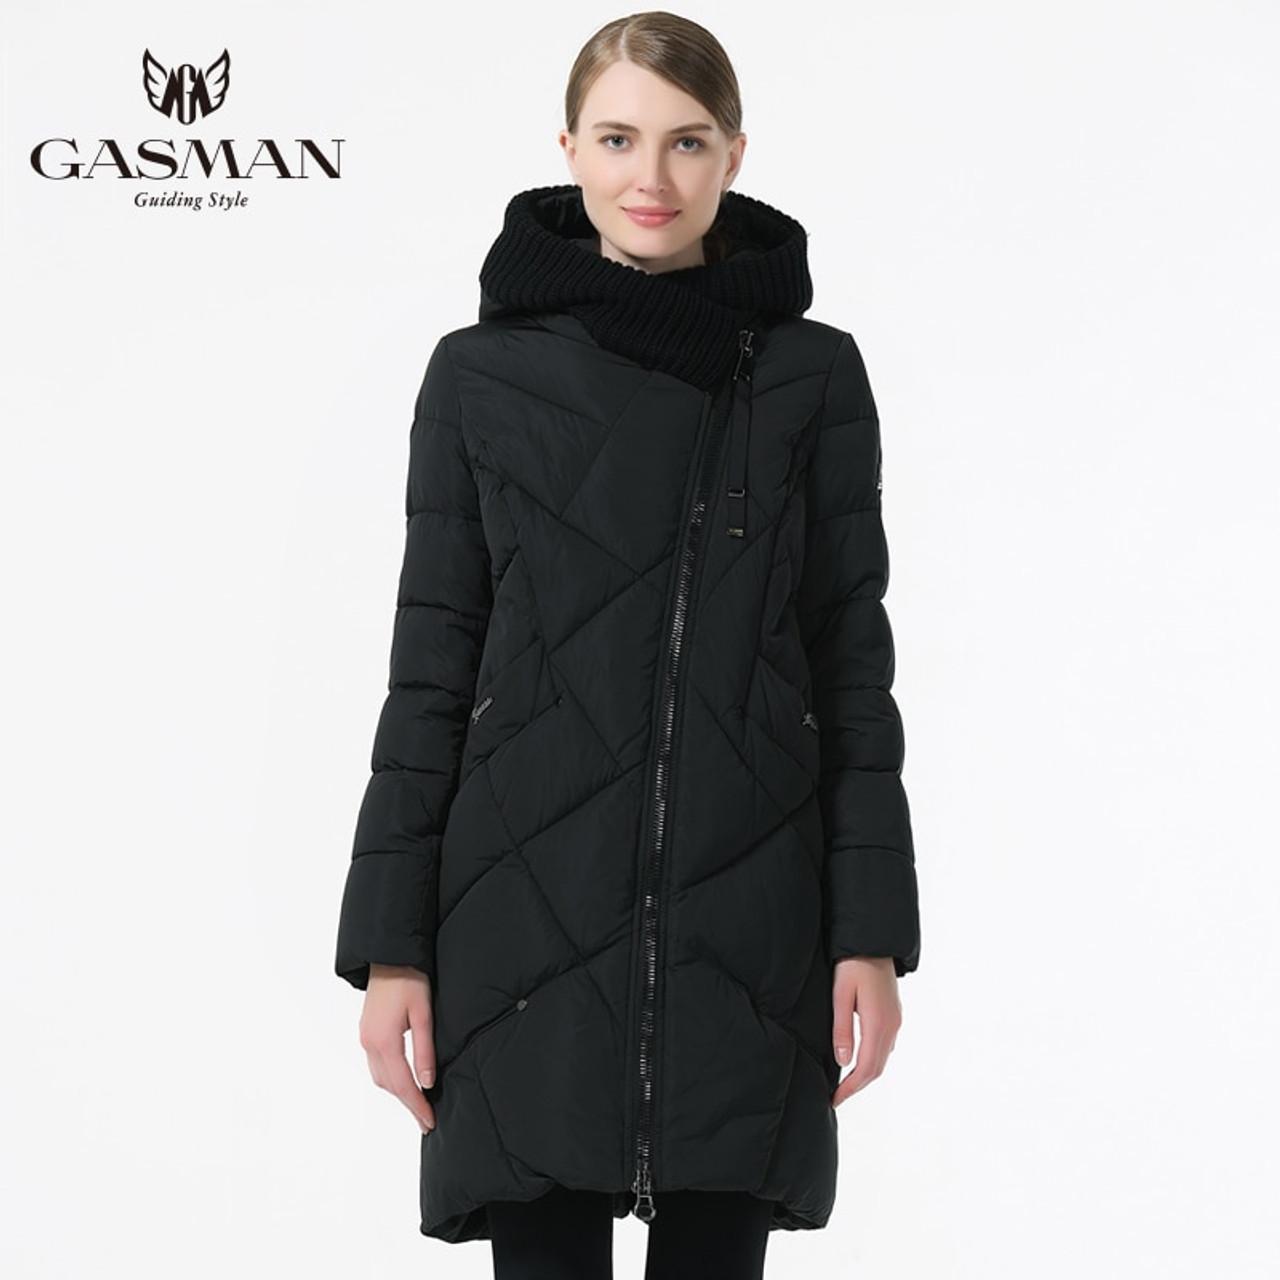 6278f385c19 ... GASMAN 2018 New Winter Collection Brand Fashion Thick Women Winter Bio Down  Jackets Hooded Women Parkas ...